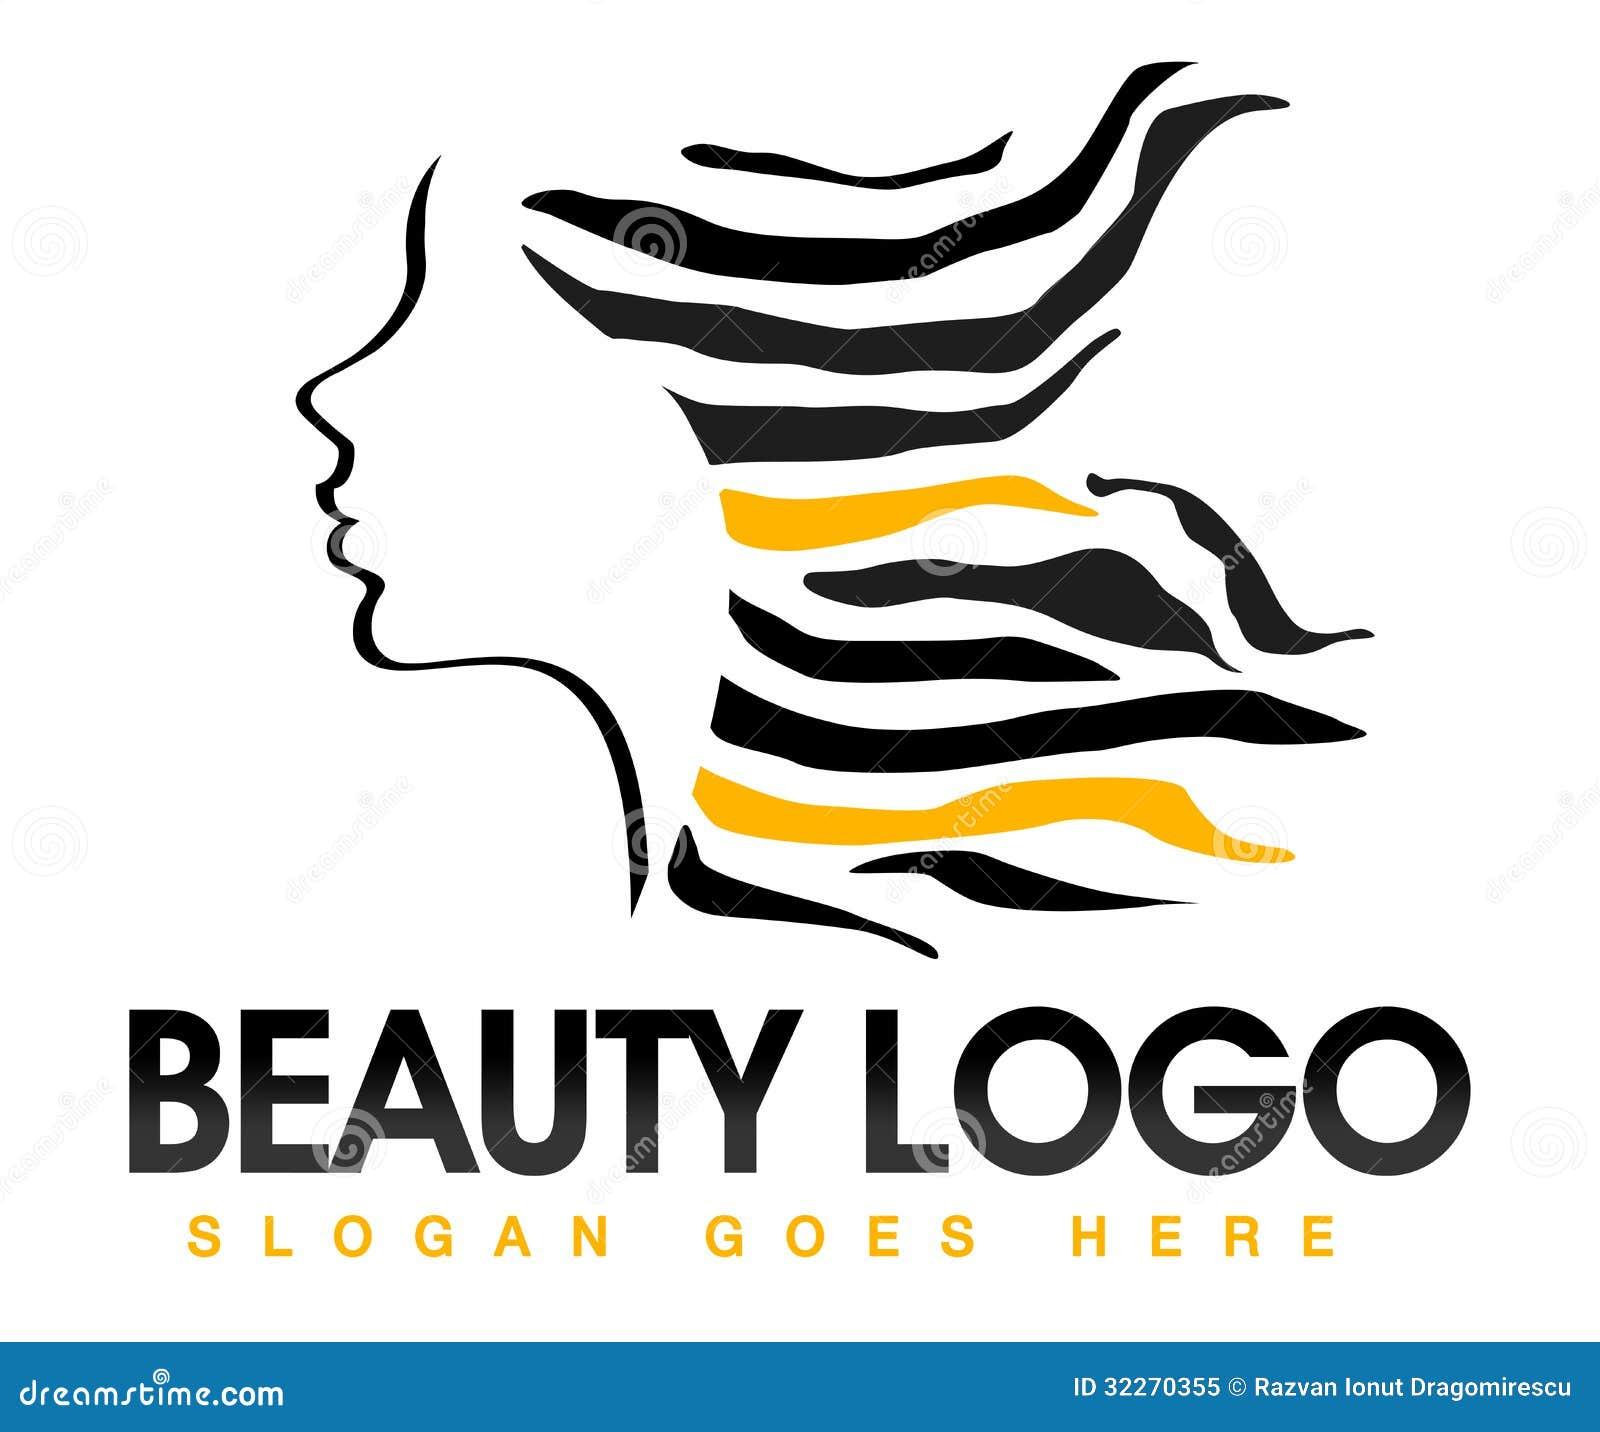 hair beauty beleza zebra het royalty logotipo cheveux drawing salon bellezza capelli embleem cabelo dei haar texture logotype desenho schoenheits